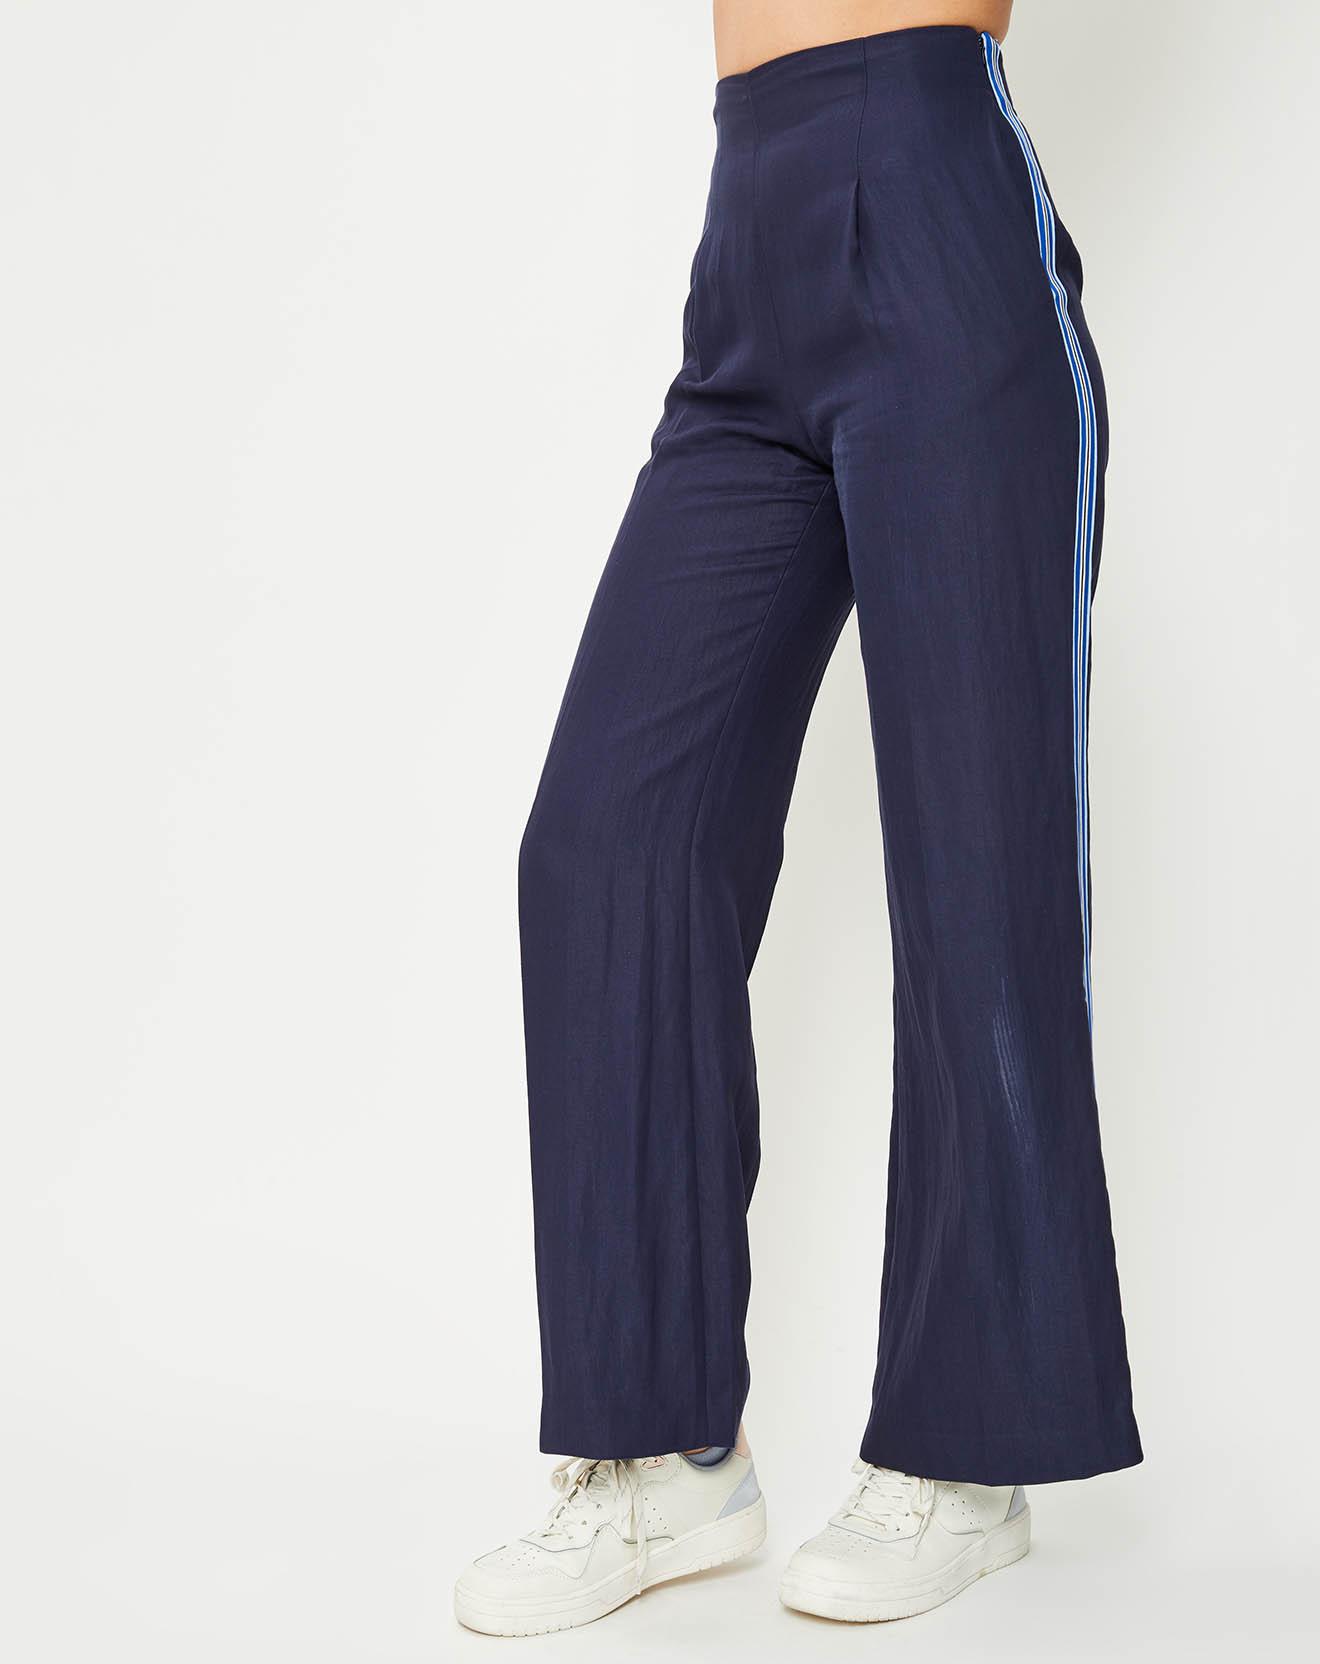 Pantalon long bande côté bleu marine - Paul Smith - Modalova